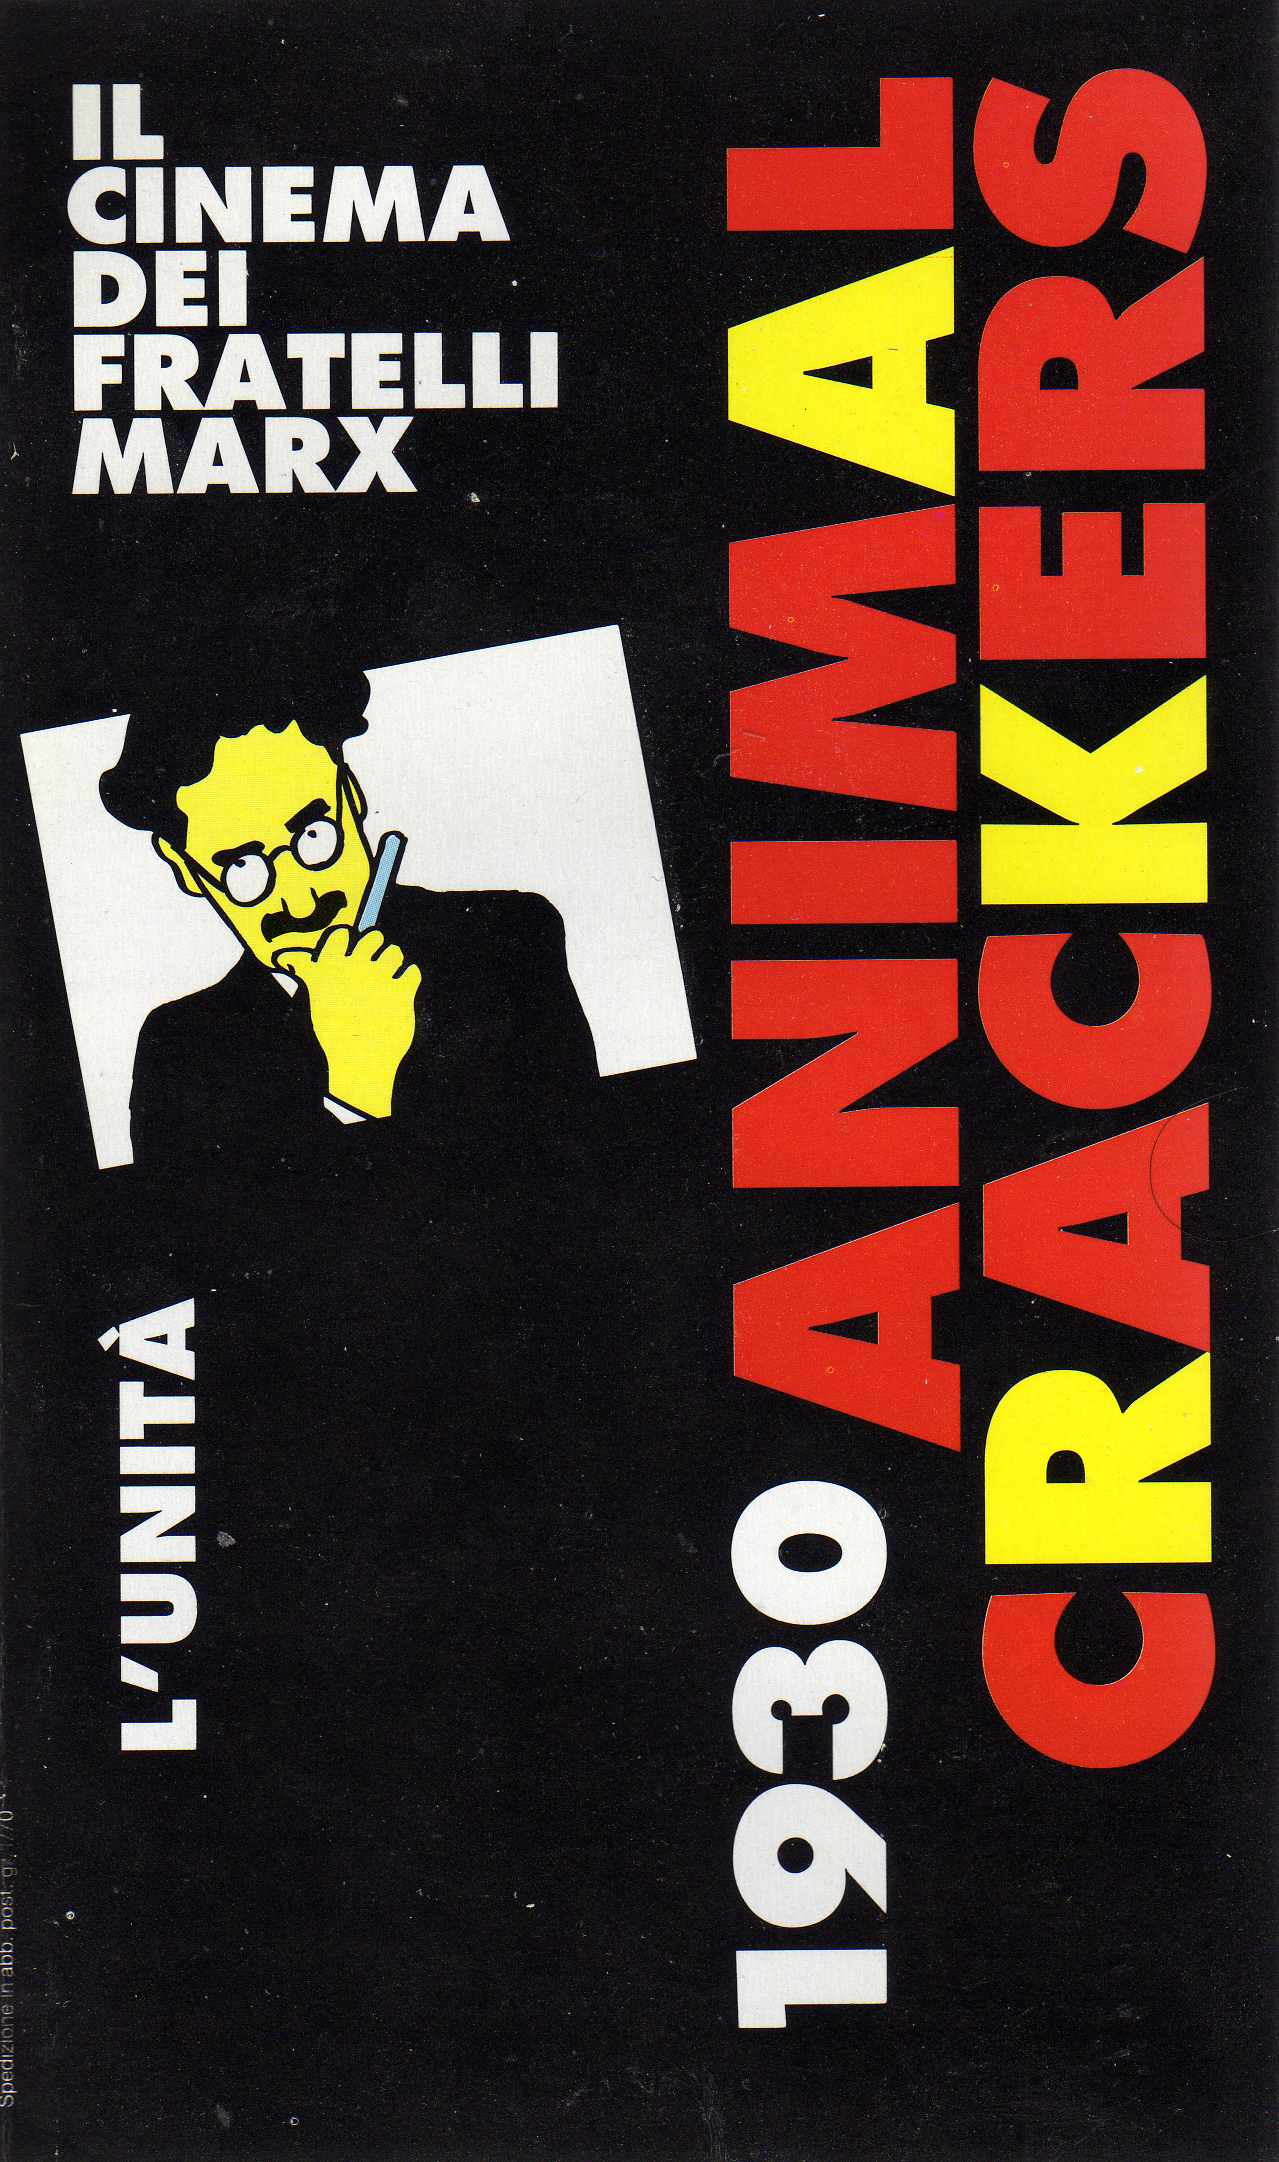 Il cinema dei fratelli Marx